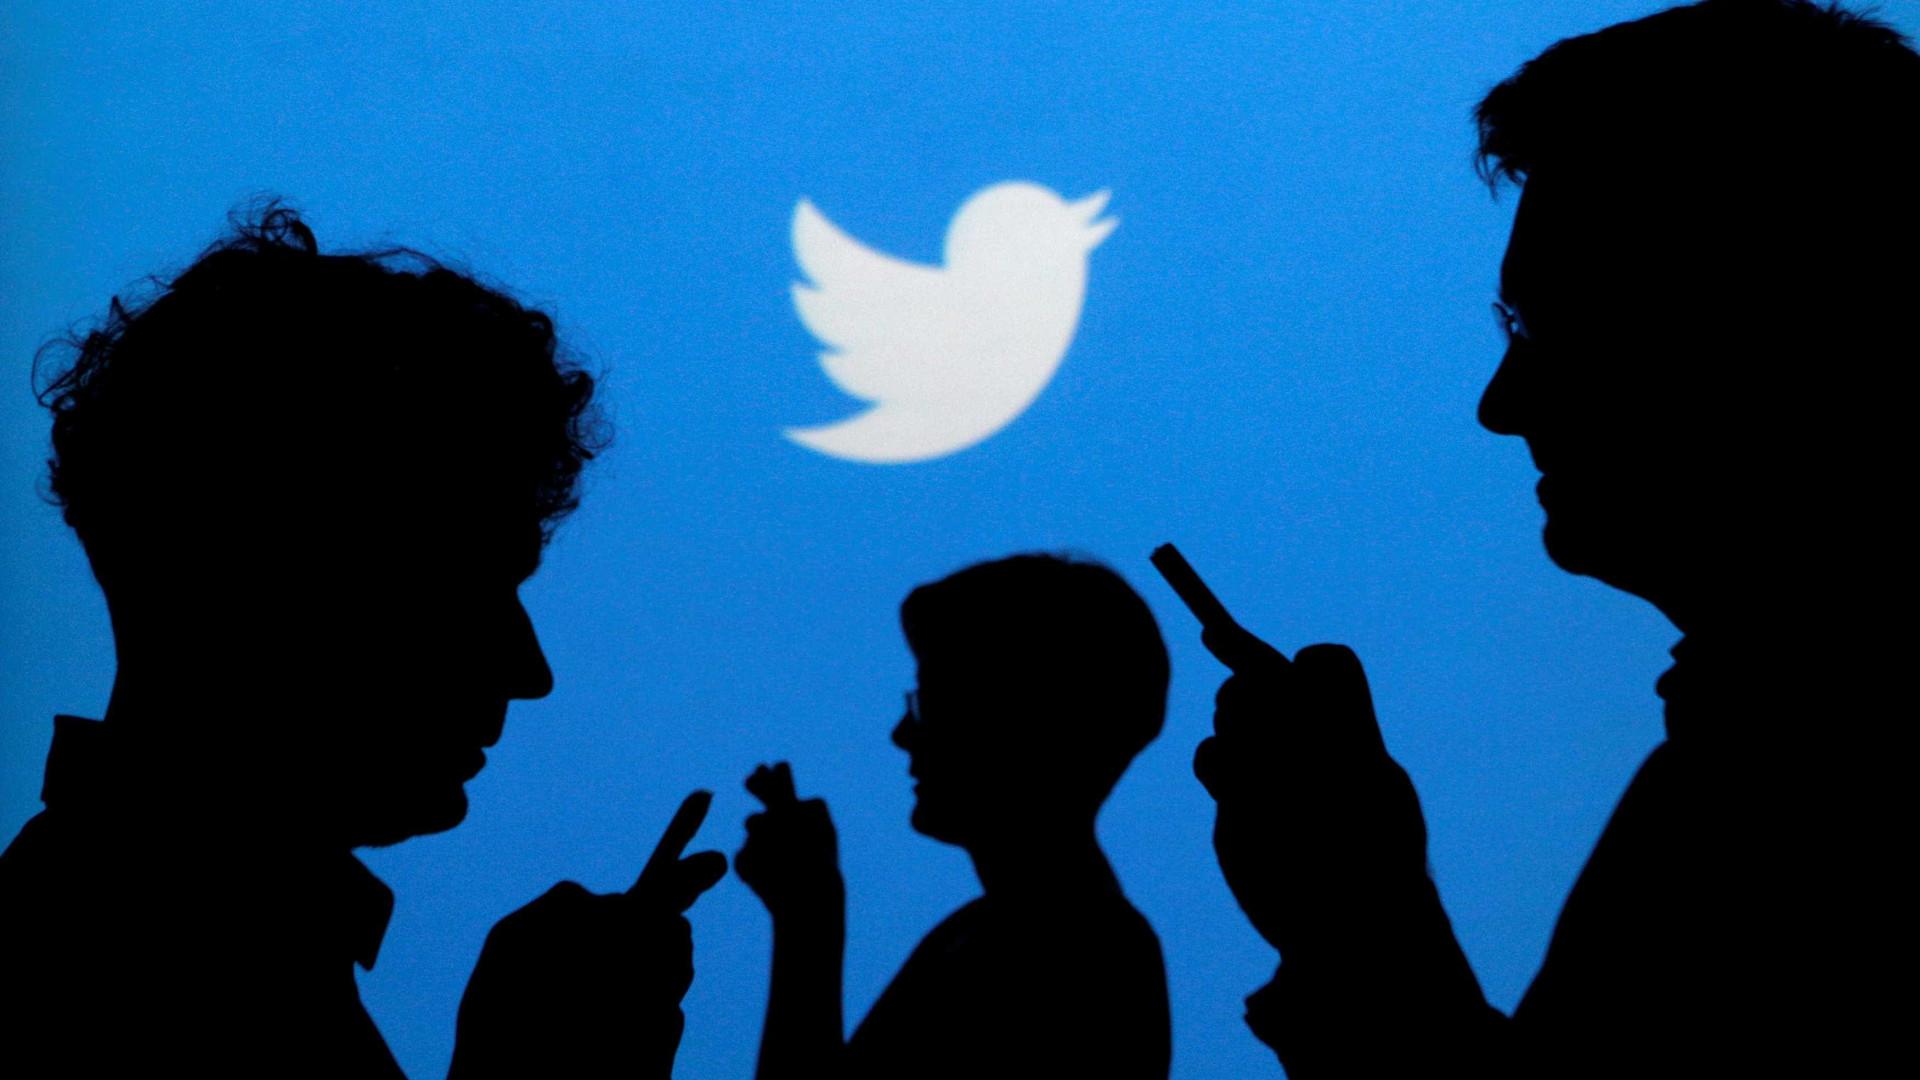 Twitter começa a testar novo limite de 280 caracteres para posts